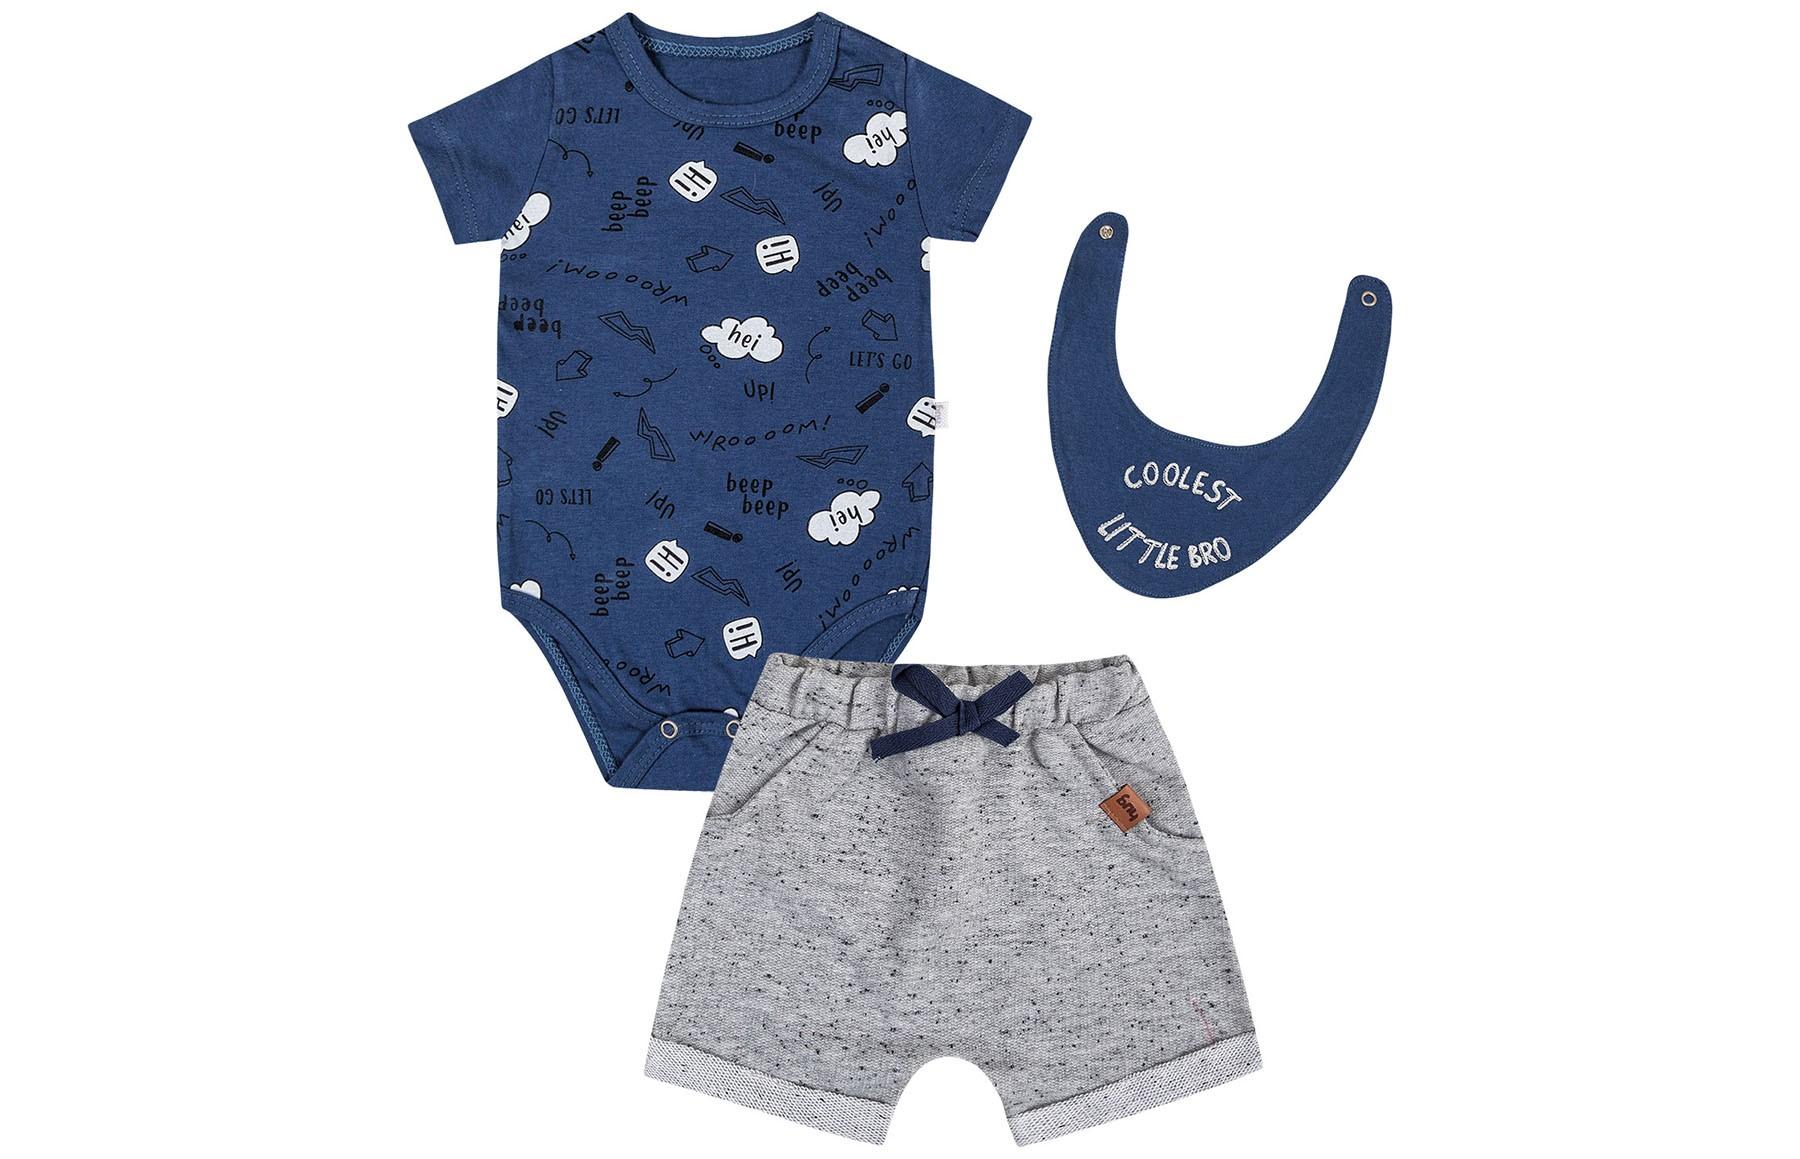 Conjunto Body mg Curto + Shorts + Bandana - Azul